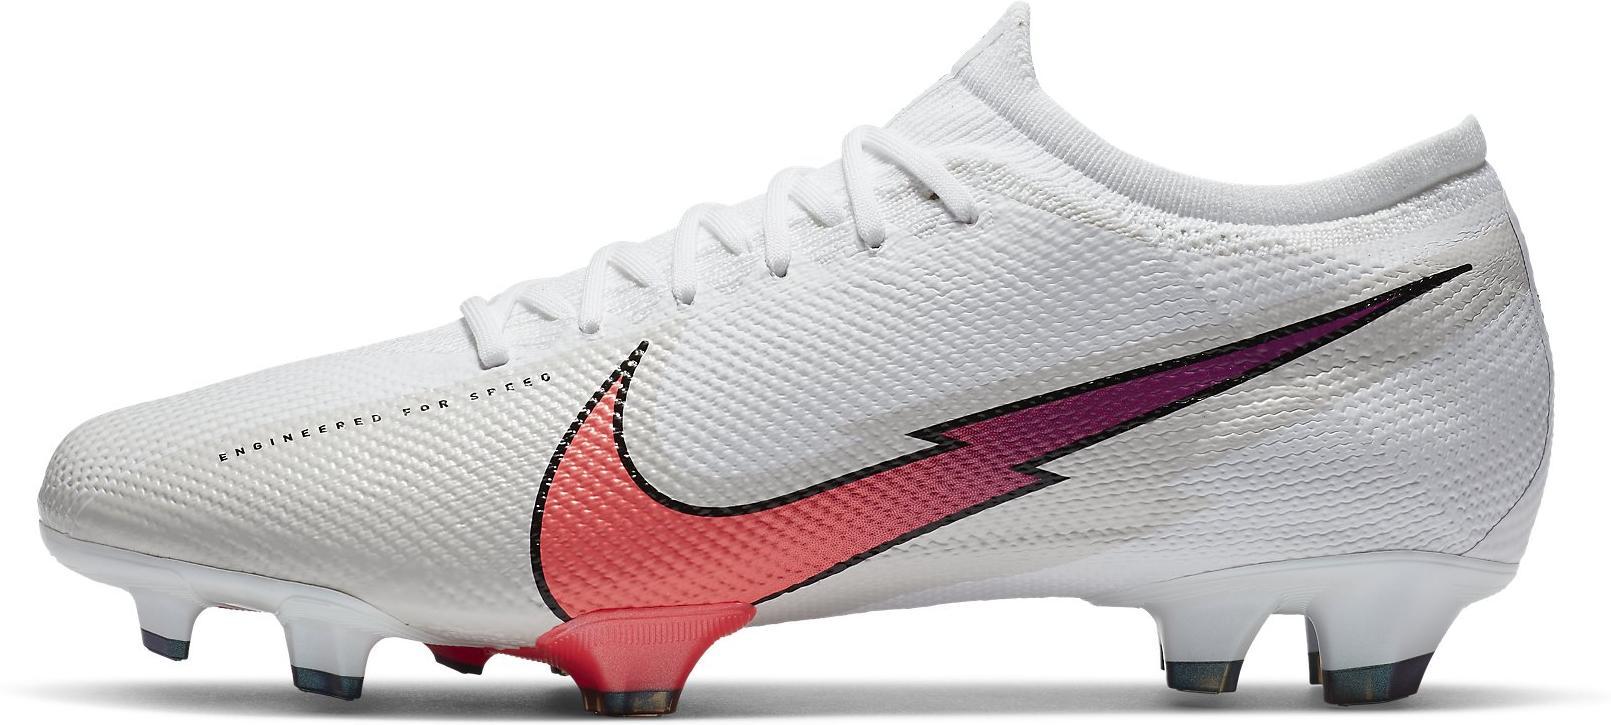 Kopačky Nike VAPOR 13 PRO FG bílá